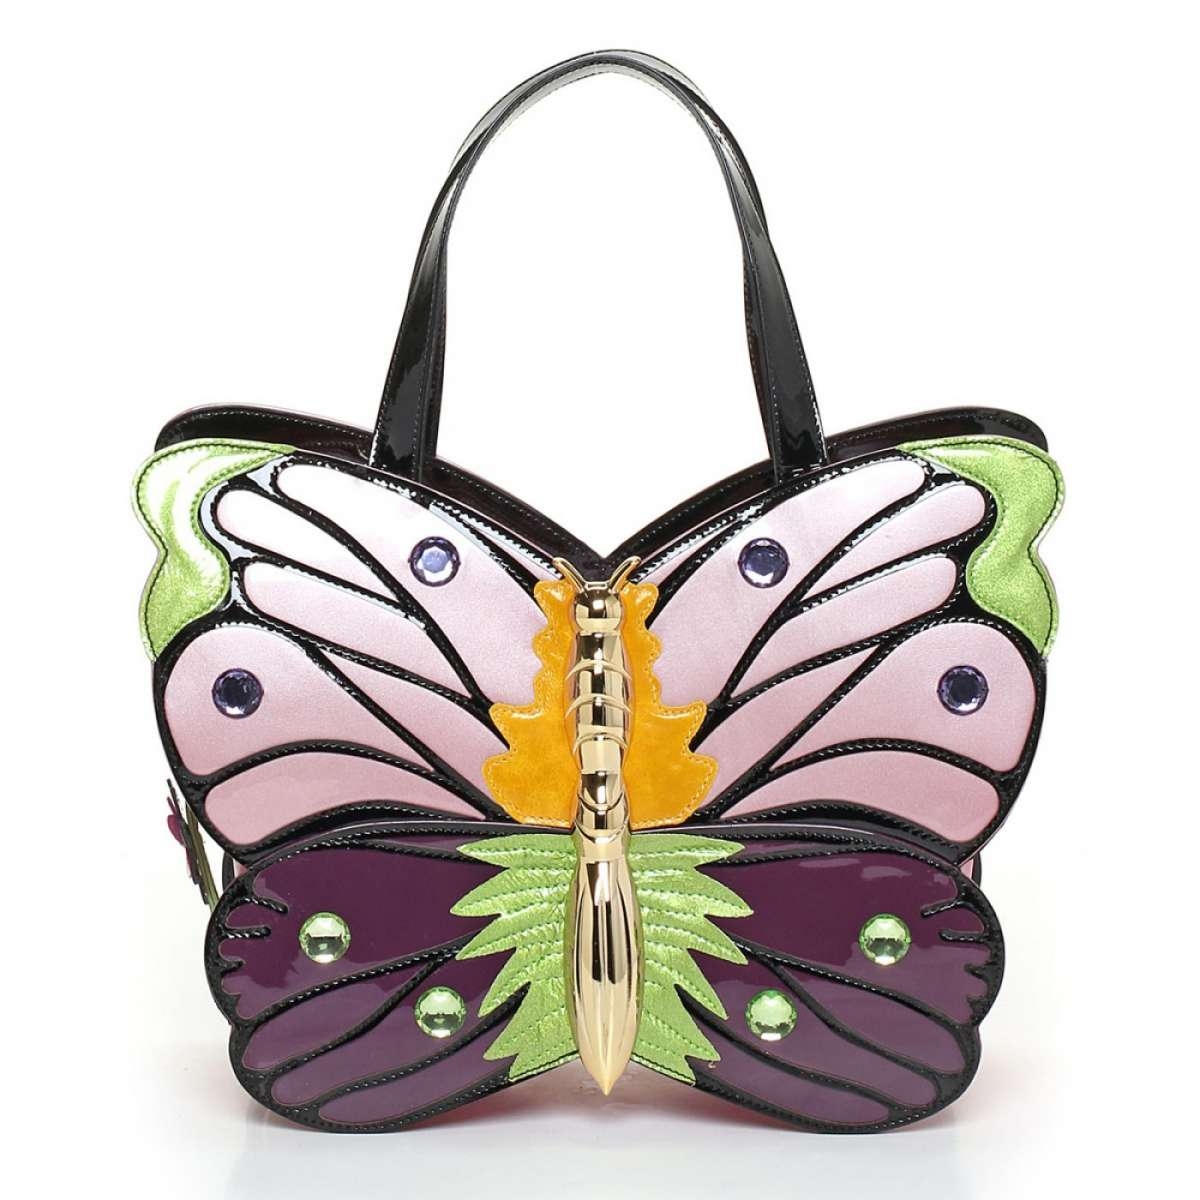 Handbag farfalla